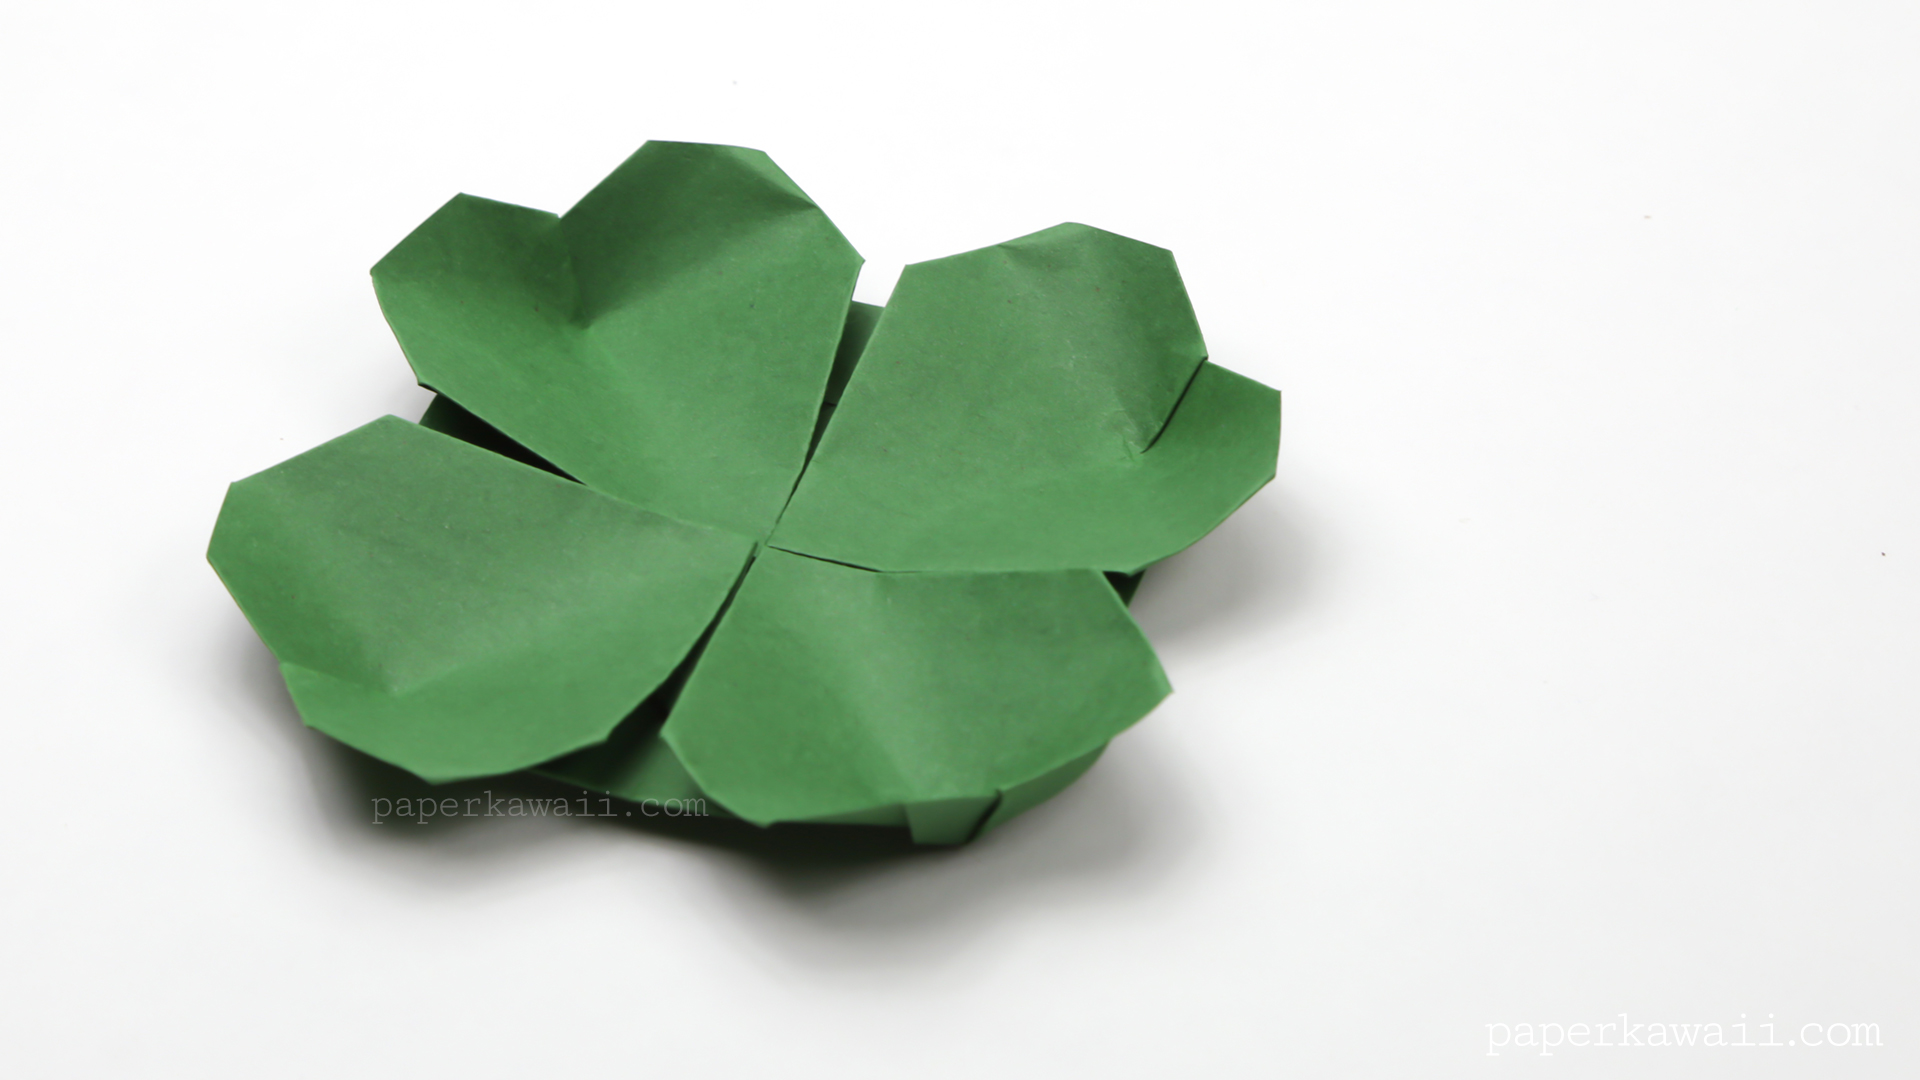 origami clover flower instructions paper kawaii